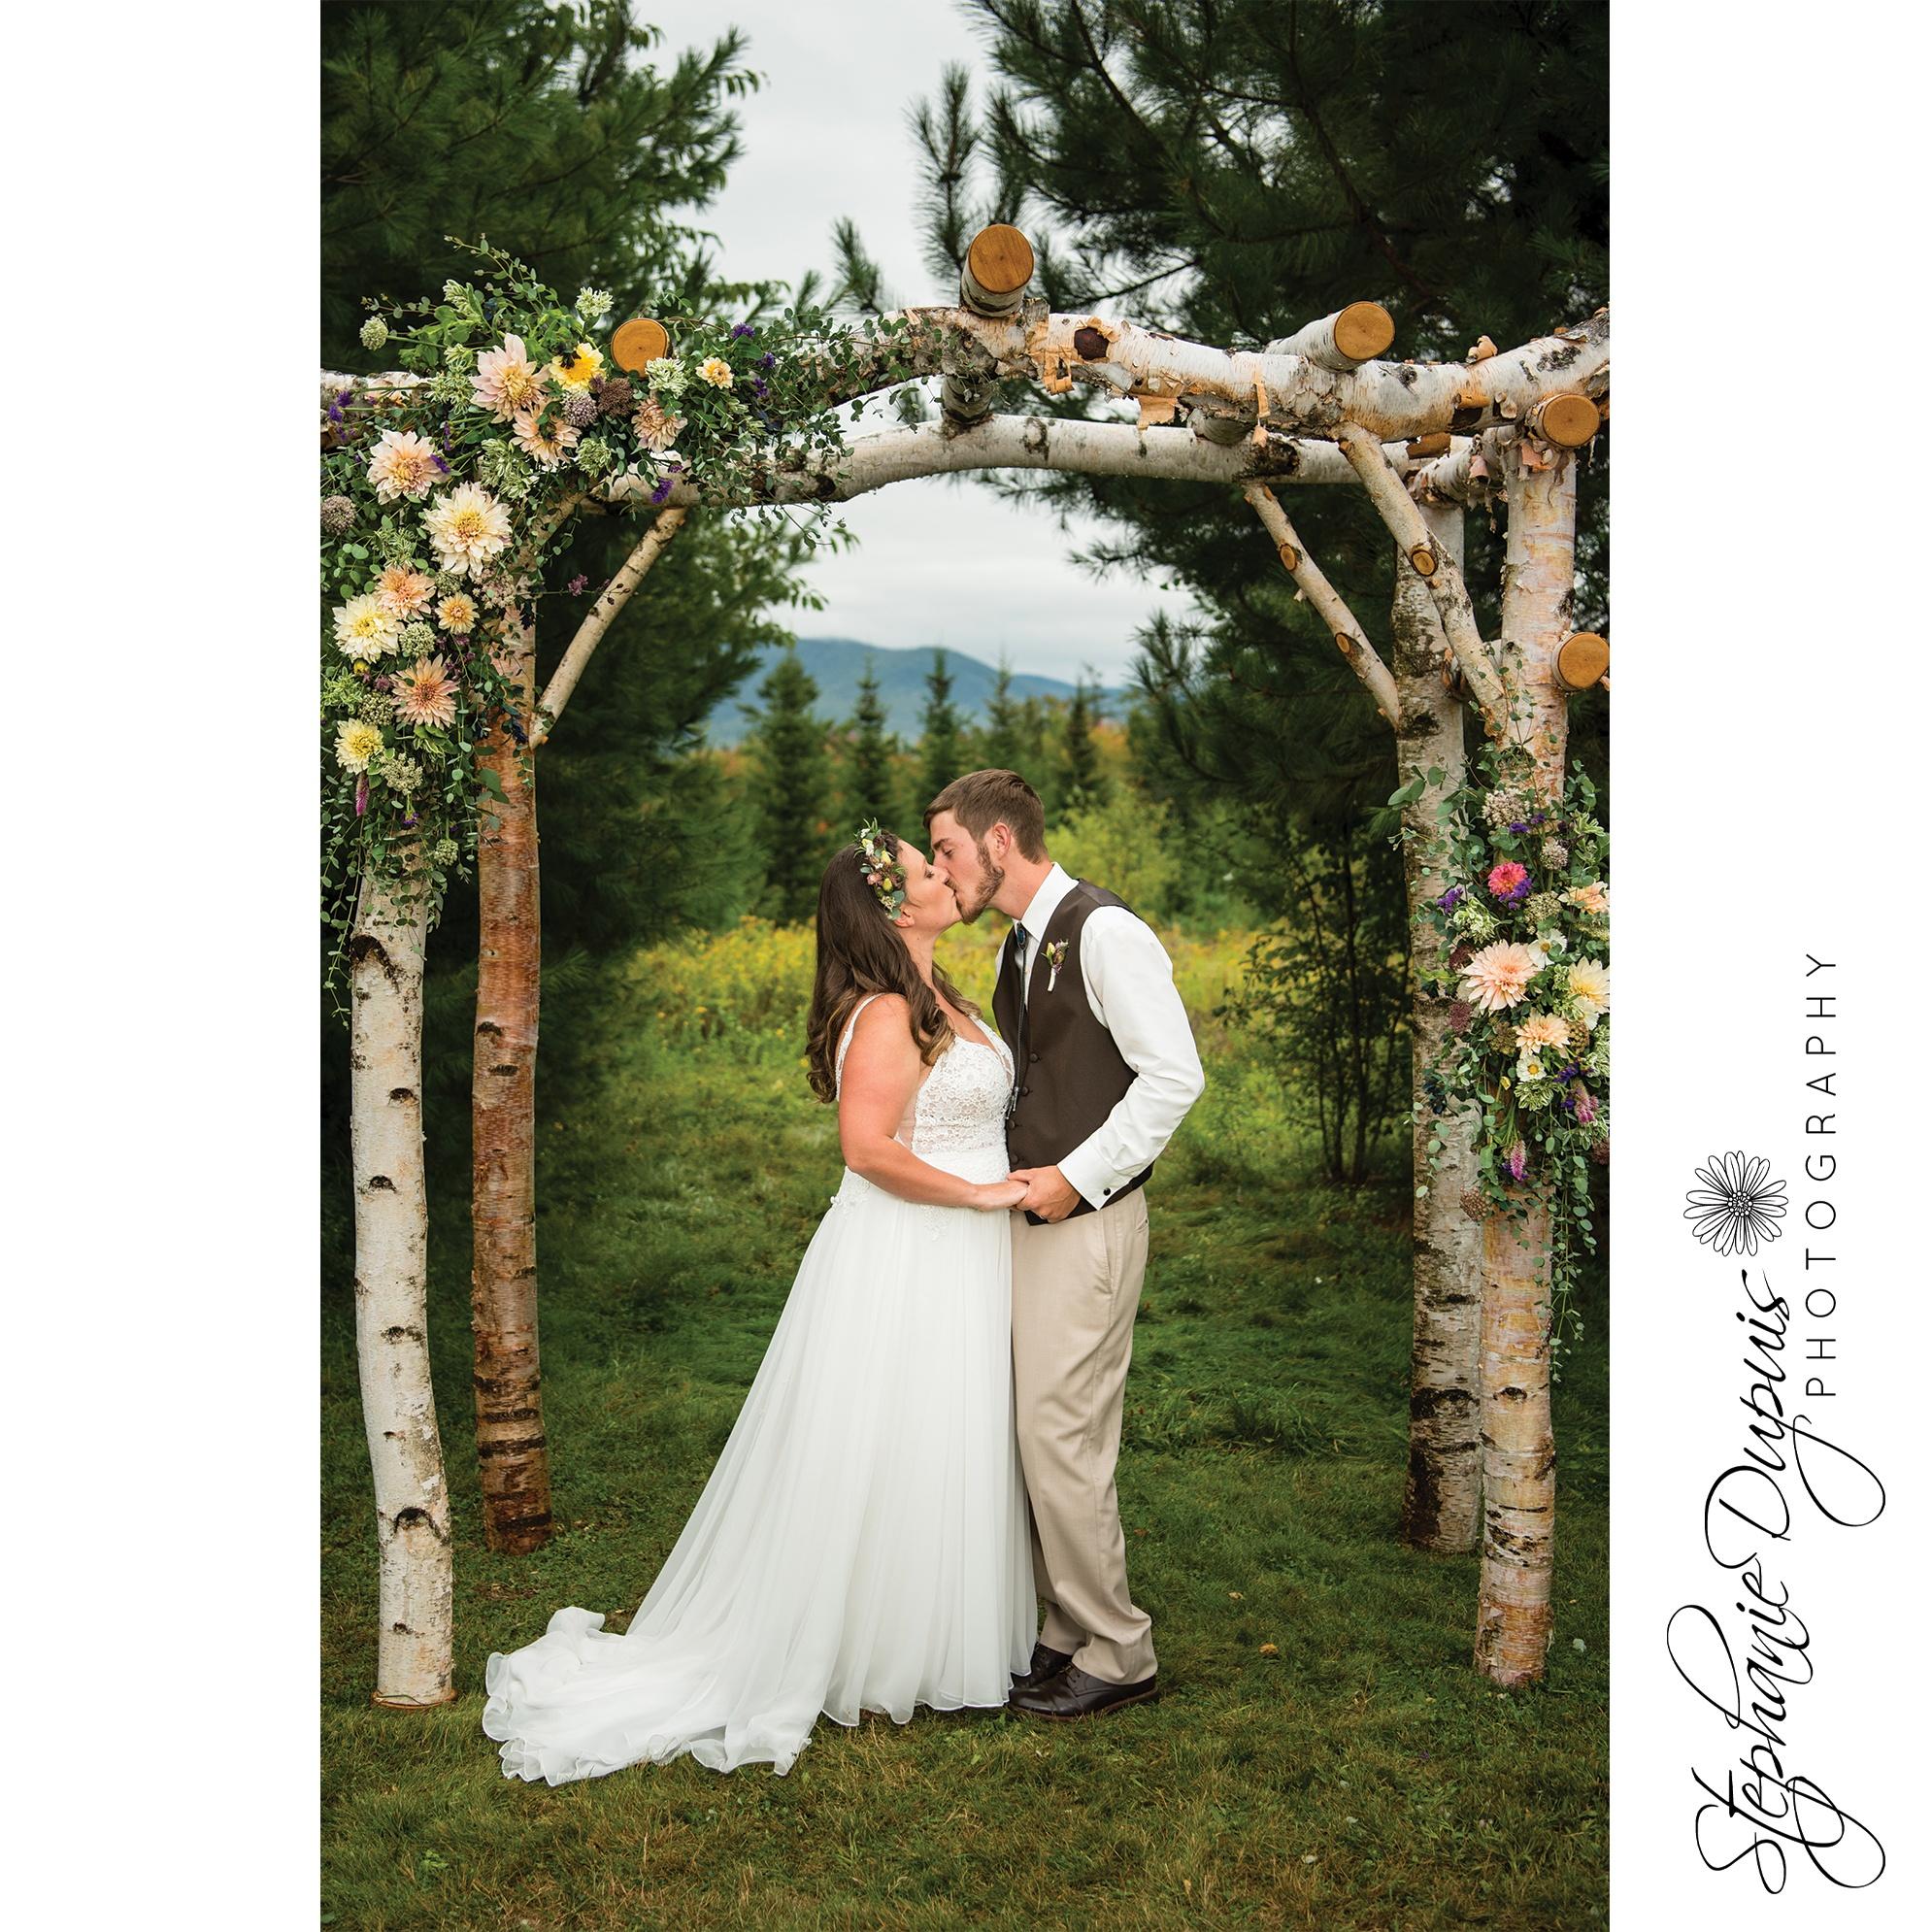 Hicks Wedding 10 - Portfolio: Hick's Wedding